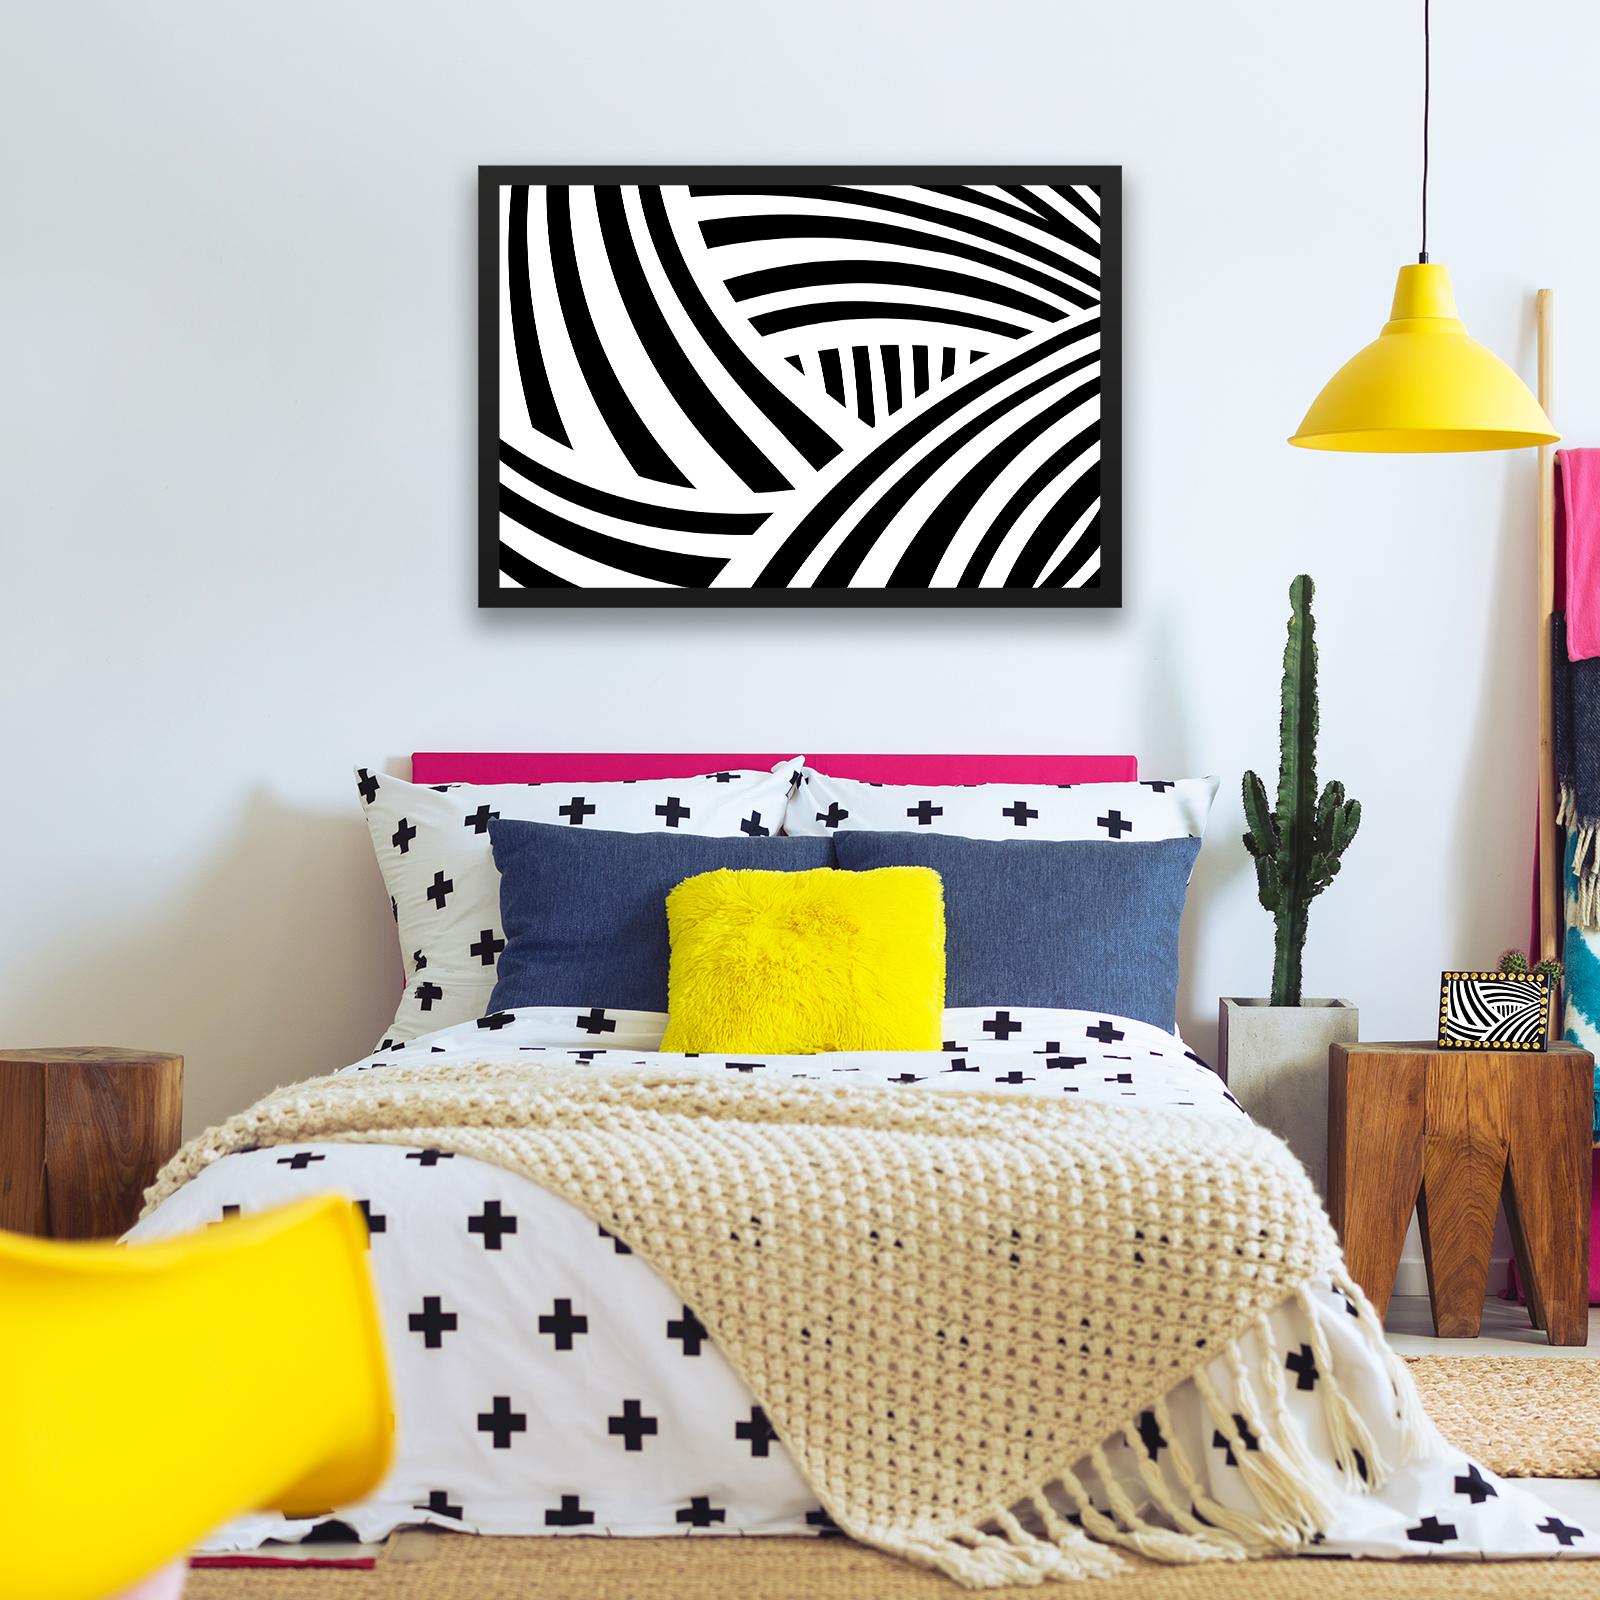 BF1AB637 BLACK WHITE Stripes moderne abstrakte gerahmte Wand-Kunst ...